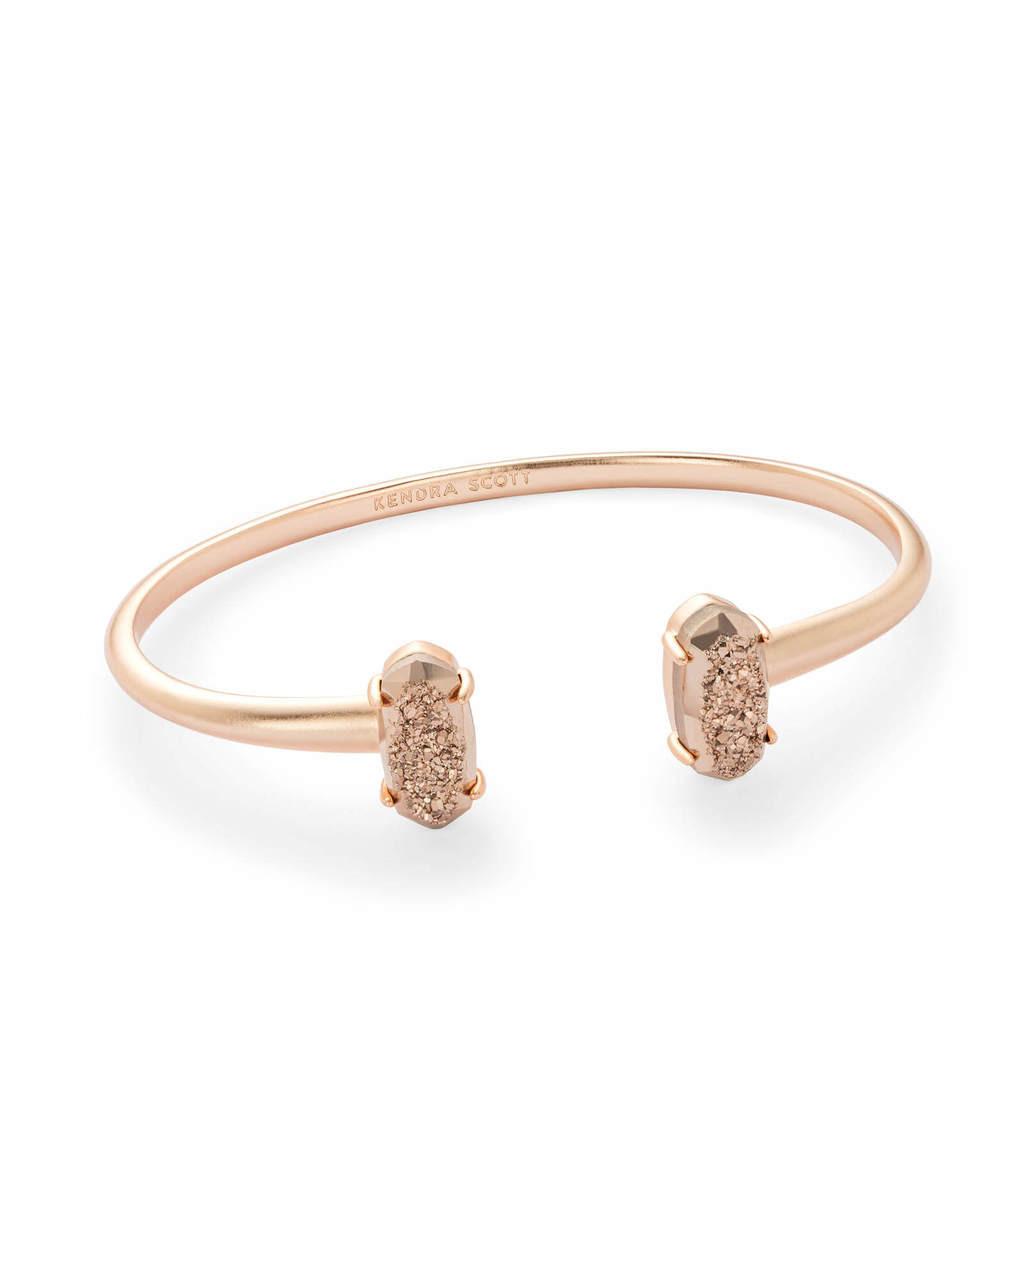 6ea682f44ec Edie Bracelet Rose Gold Drusy - Thompson's